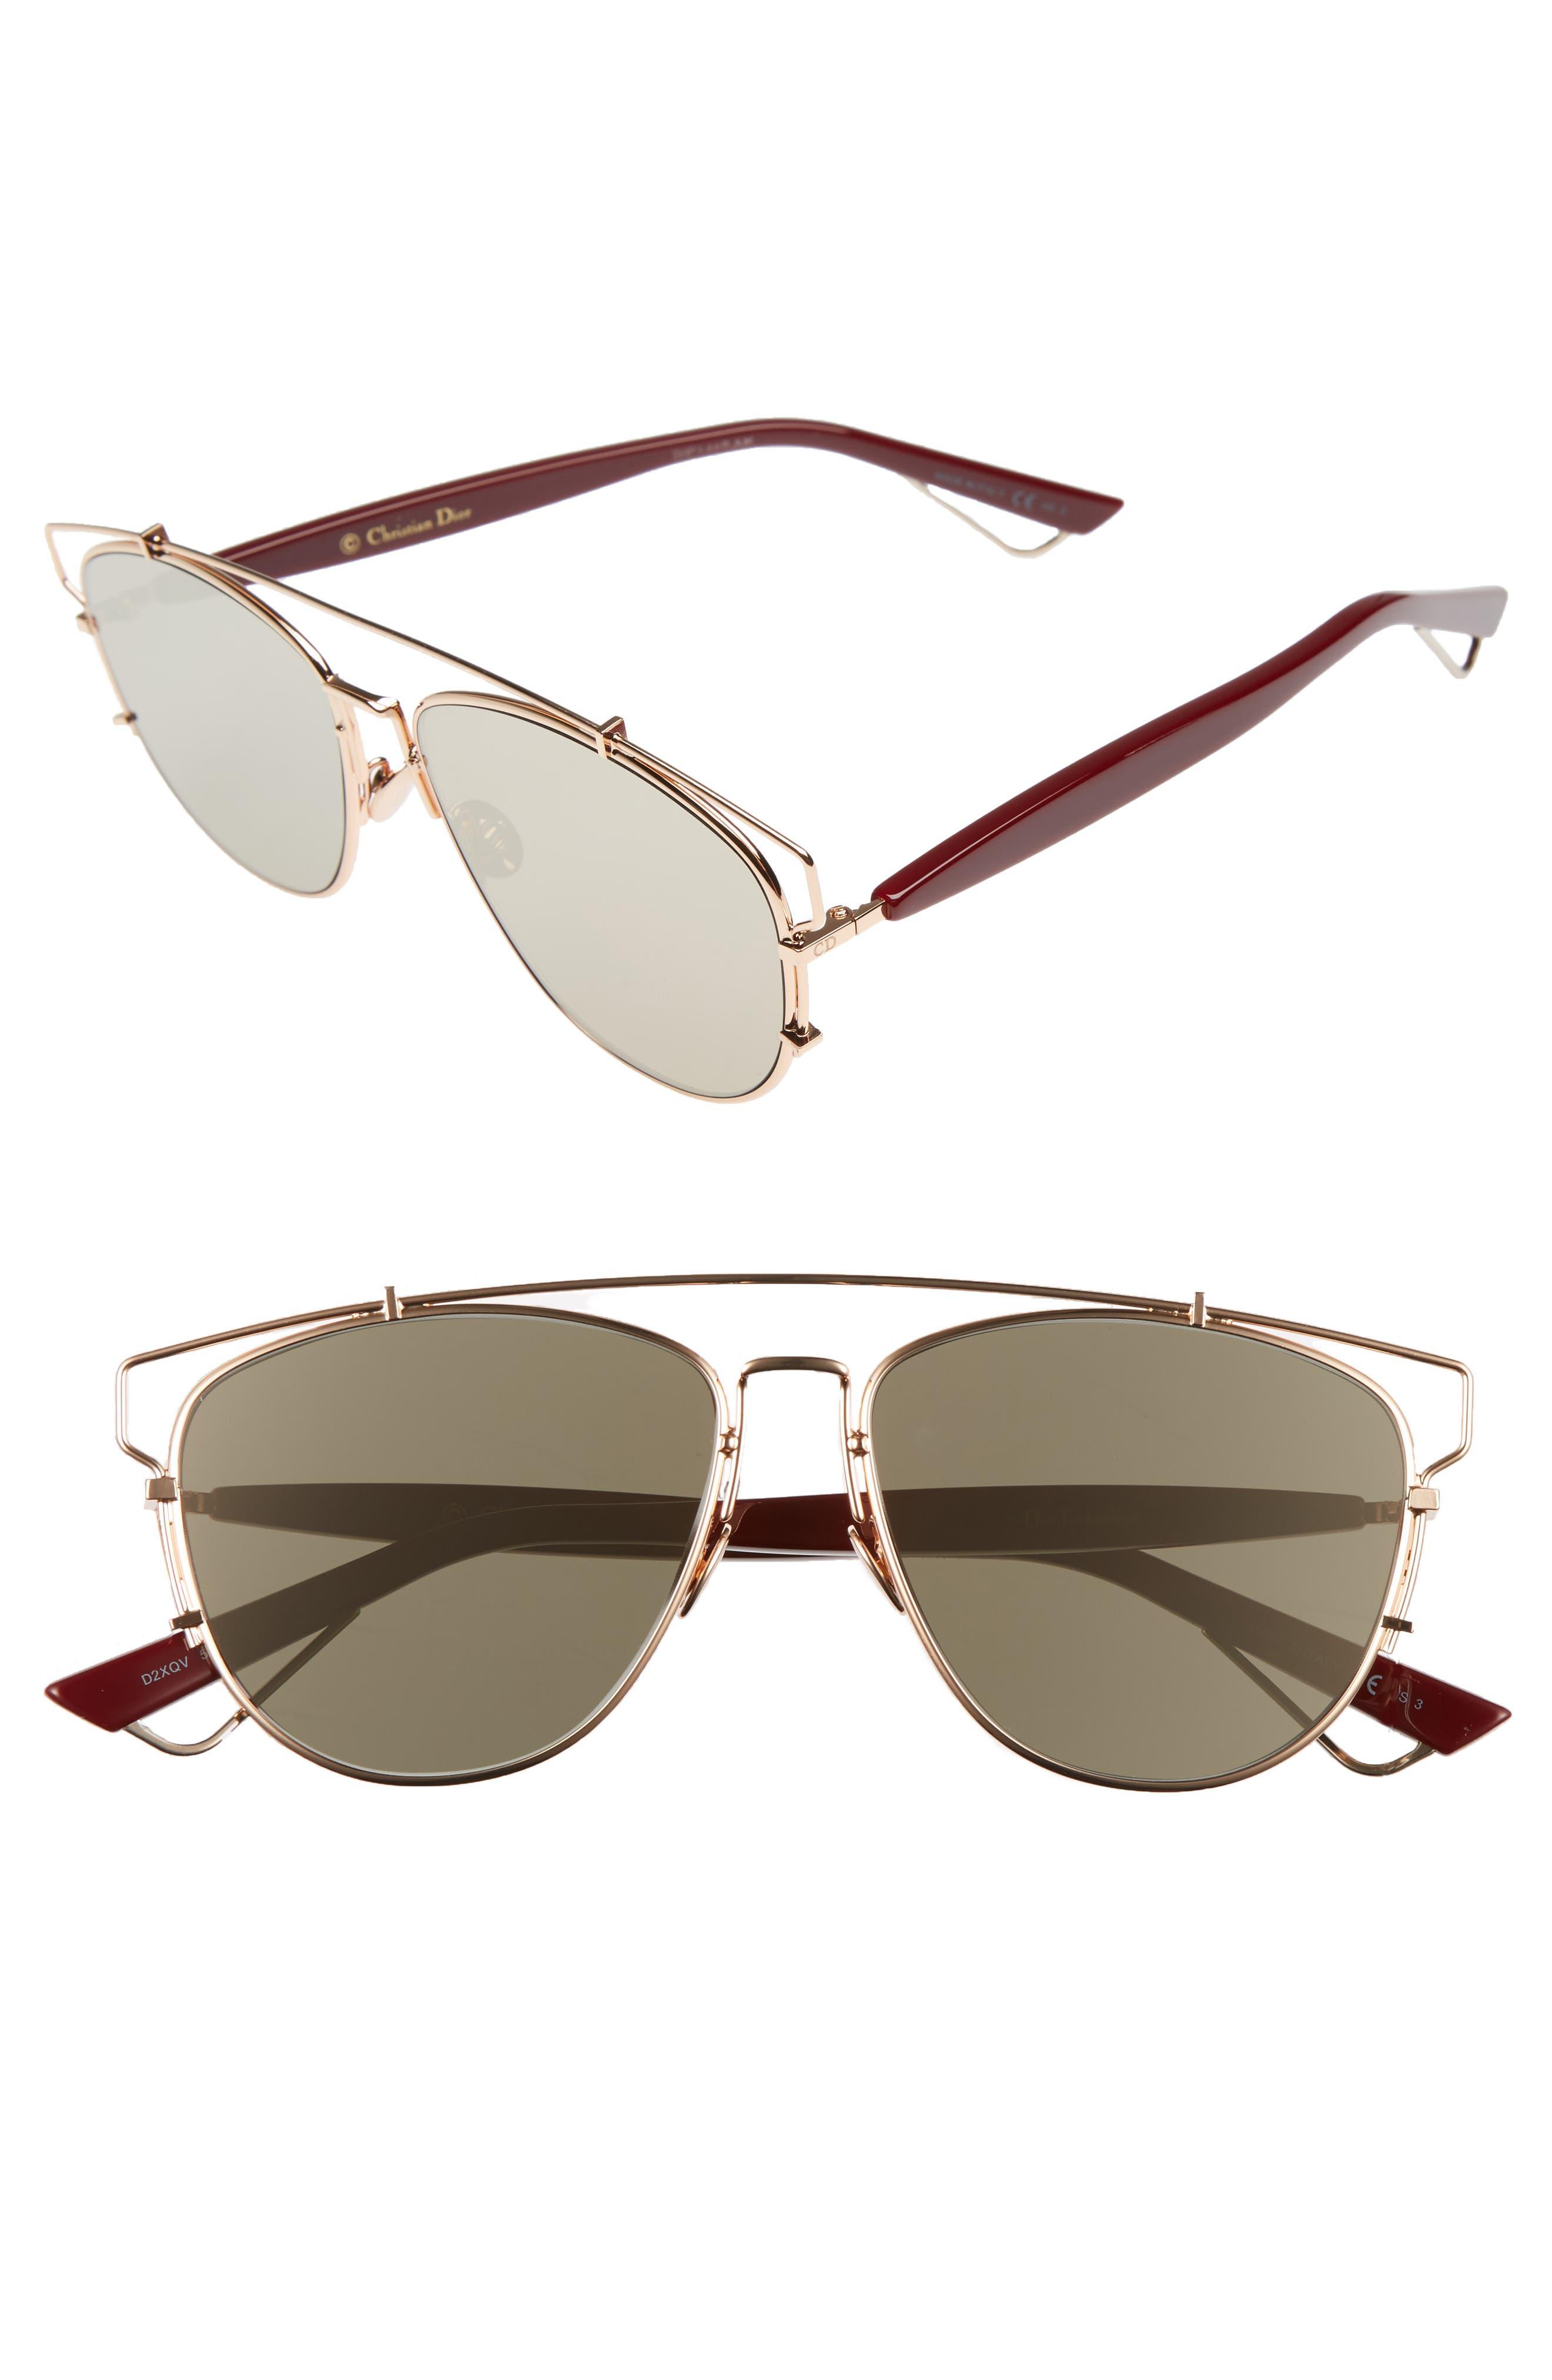 Technologic 57mm Brow Bar Sunglasses,                             Main thumbnail 1, color,                             Gold Copper/ Blue